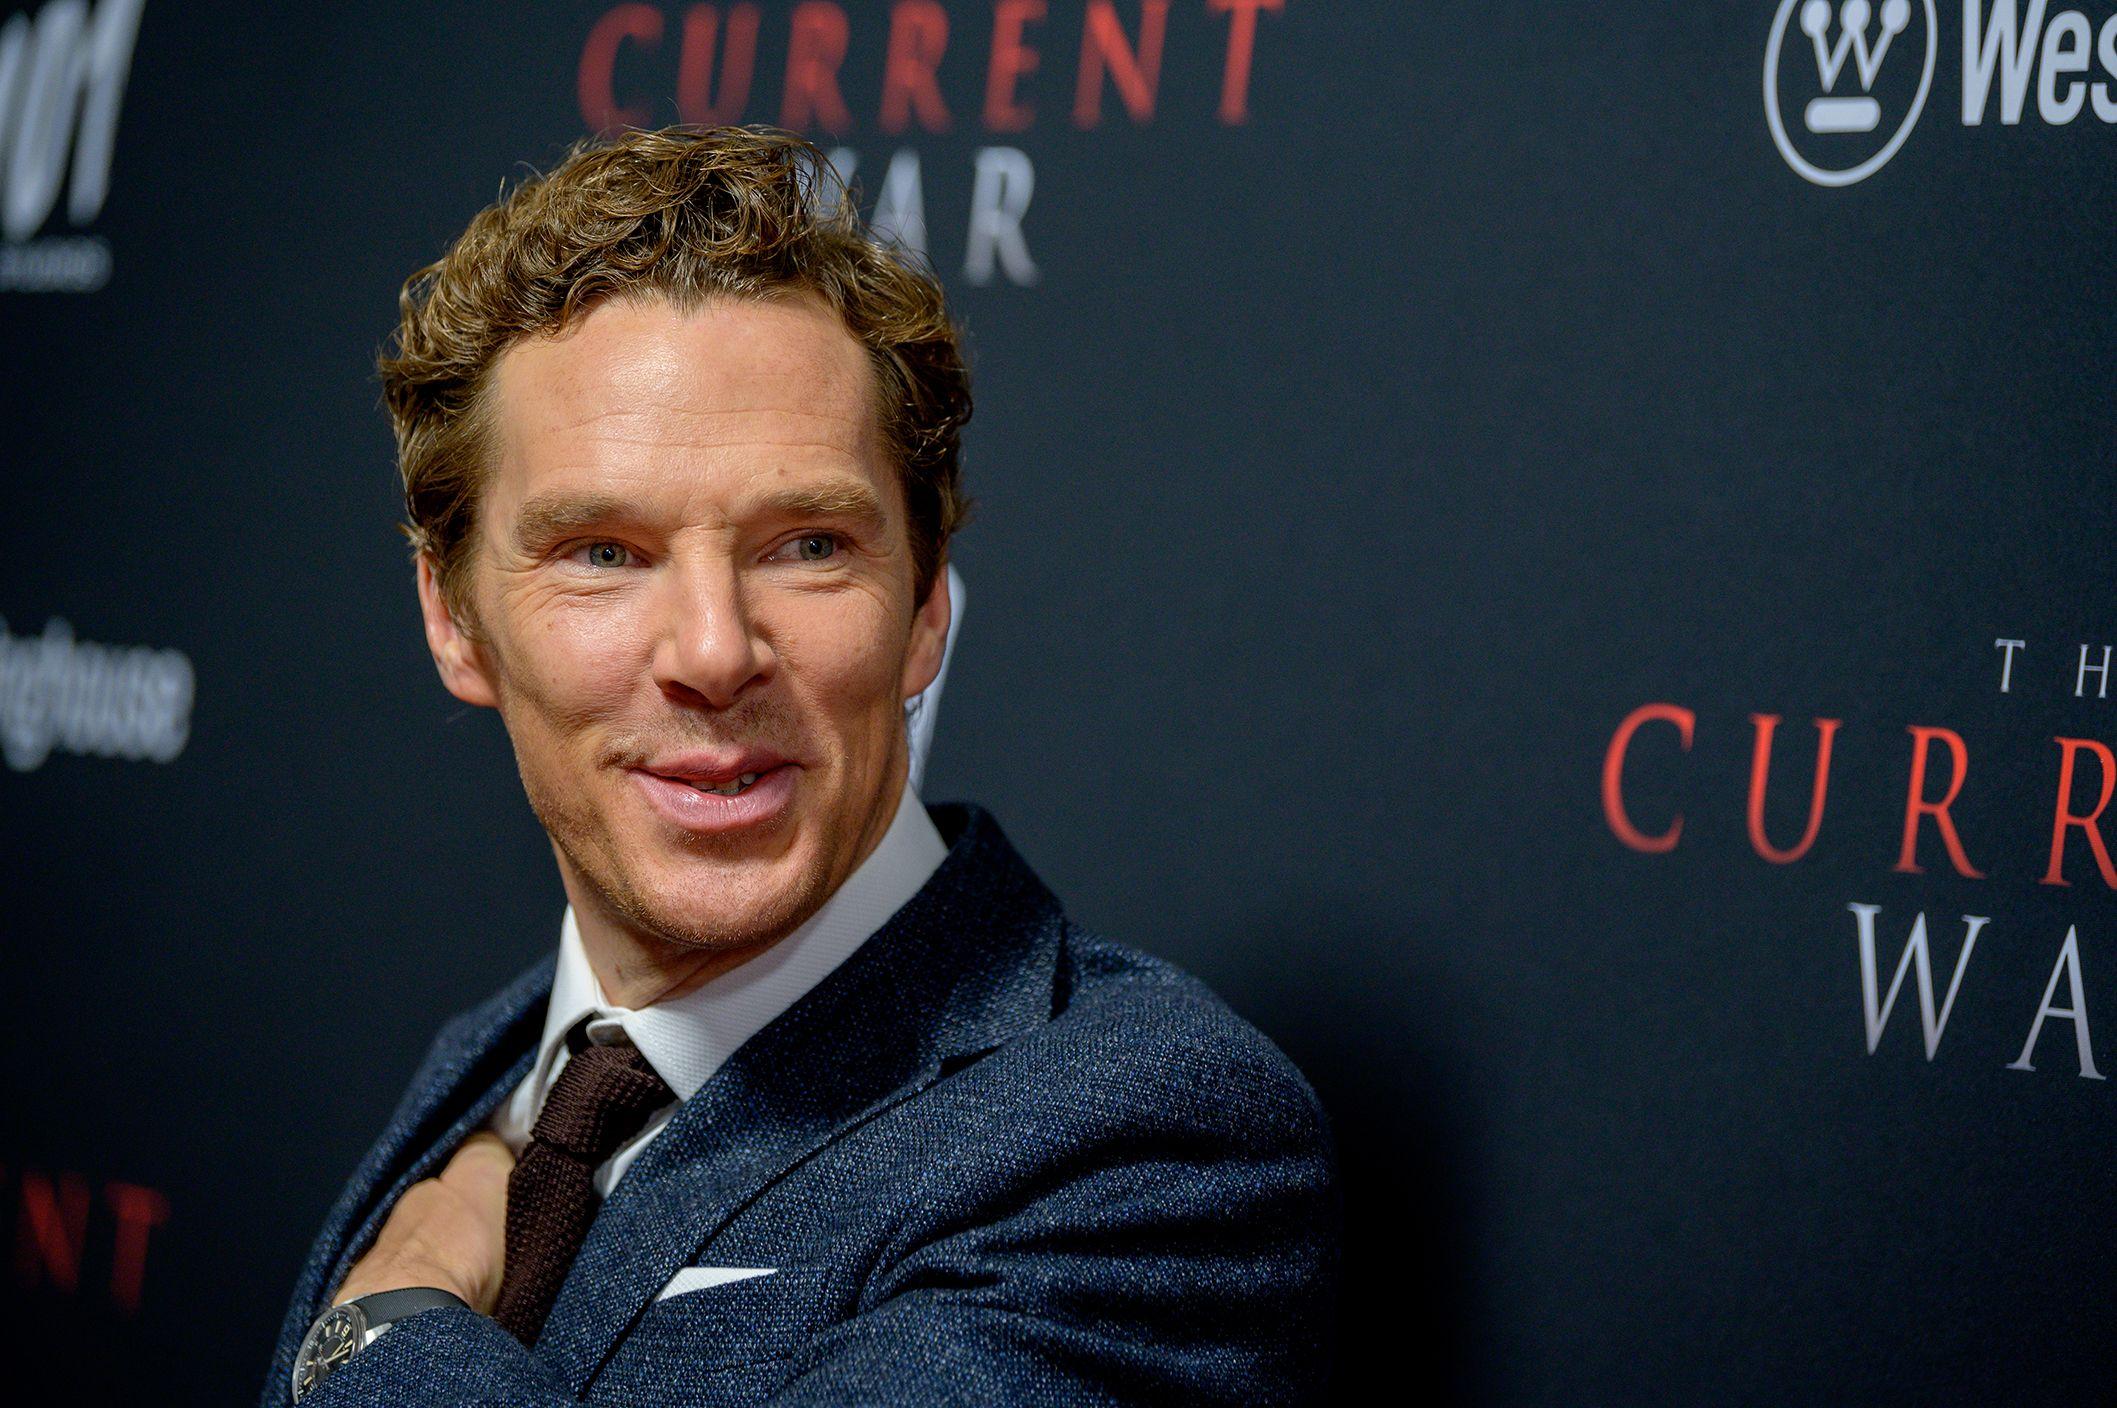 Benedict Cumberbatch's Watch Has Some Wild Stories